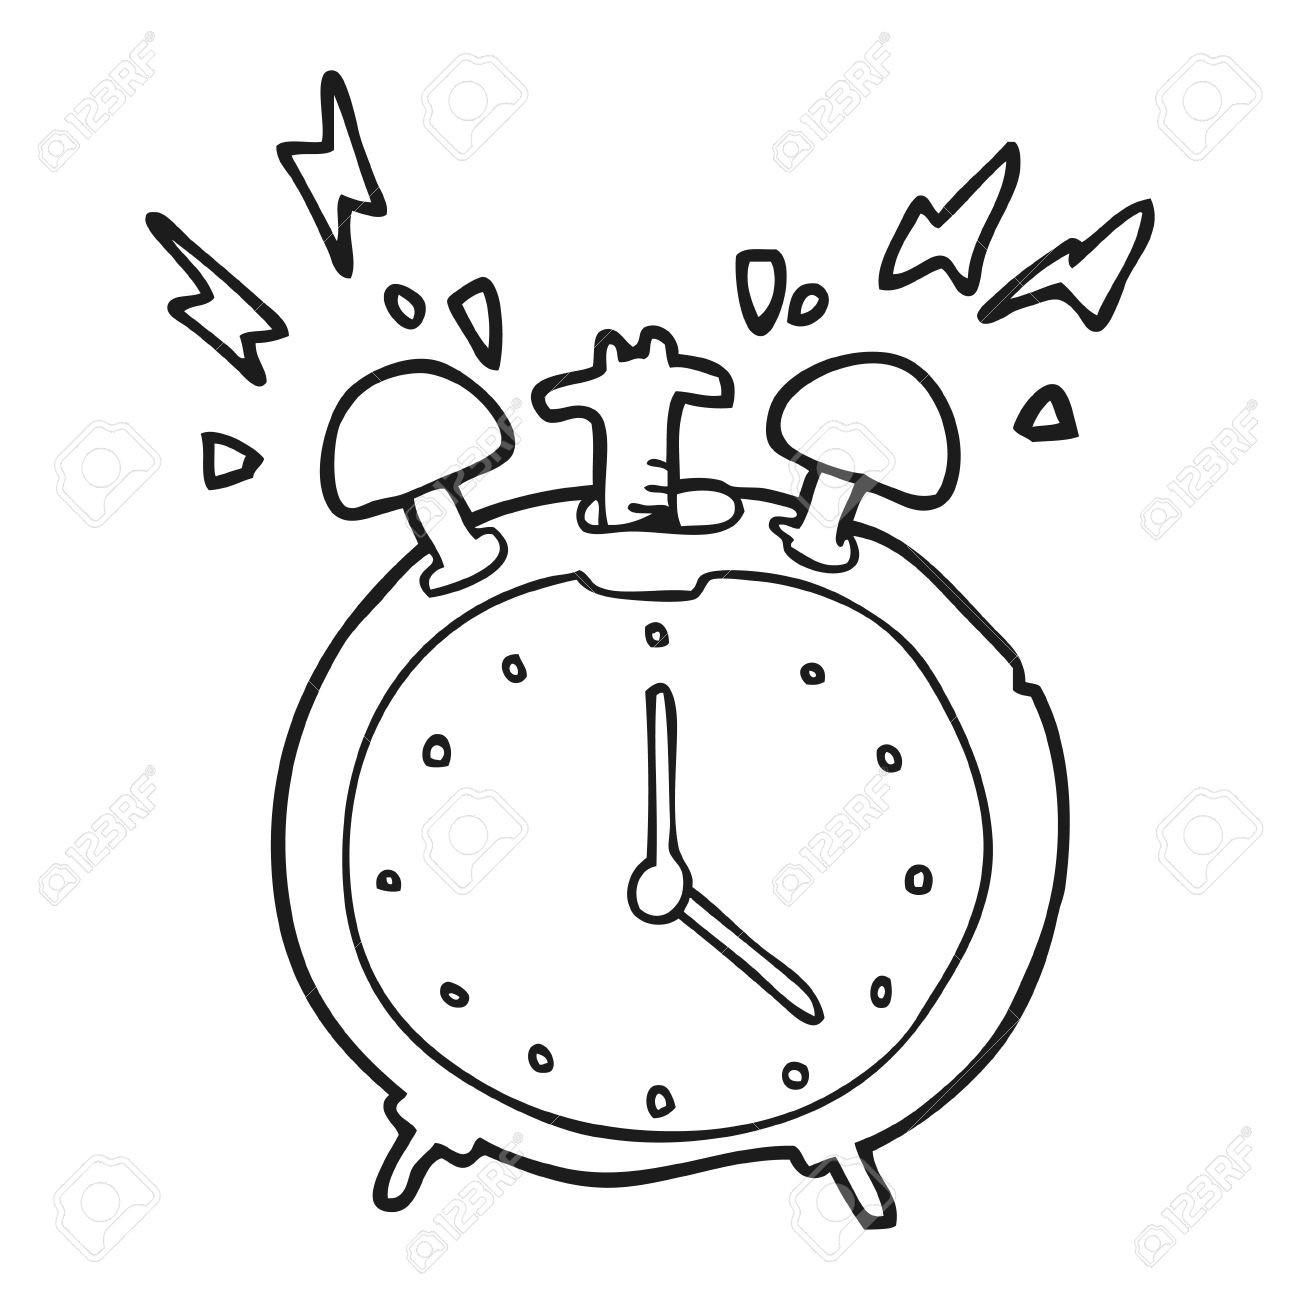 1300x1300 Clock Coloring Page Unique Alarm Line Art Free Clip Resume Also